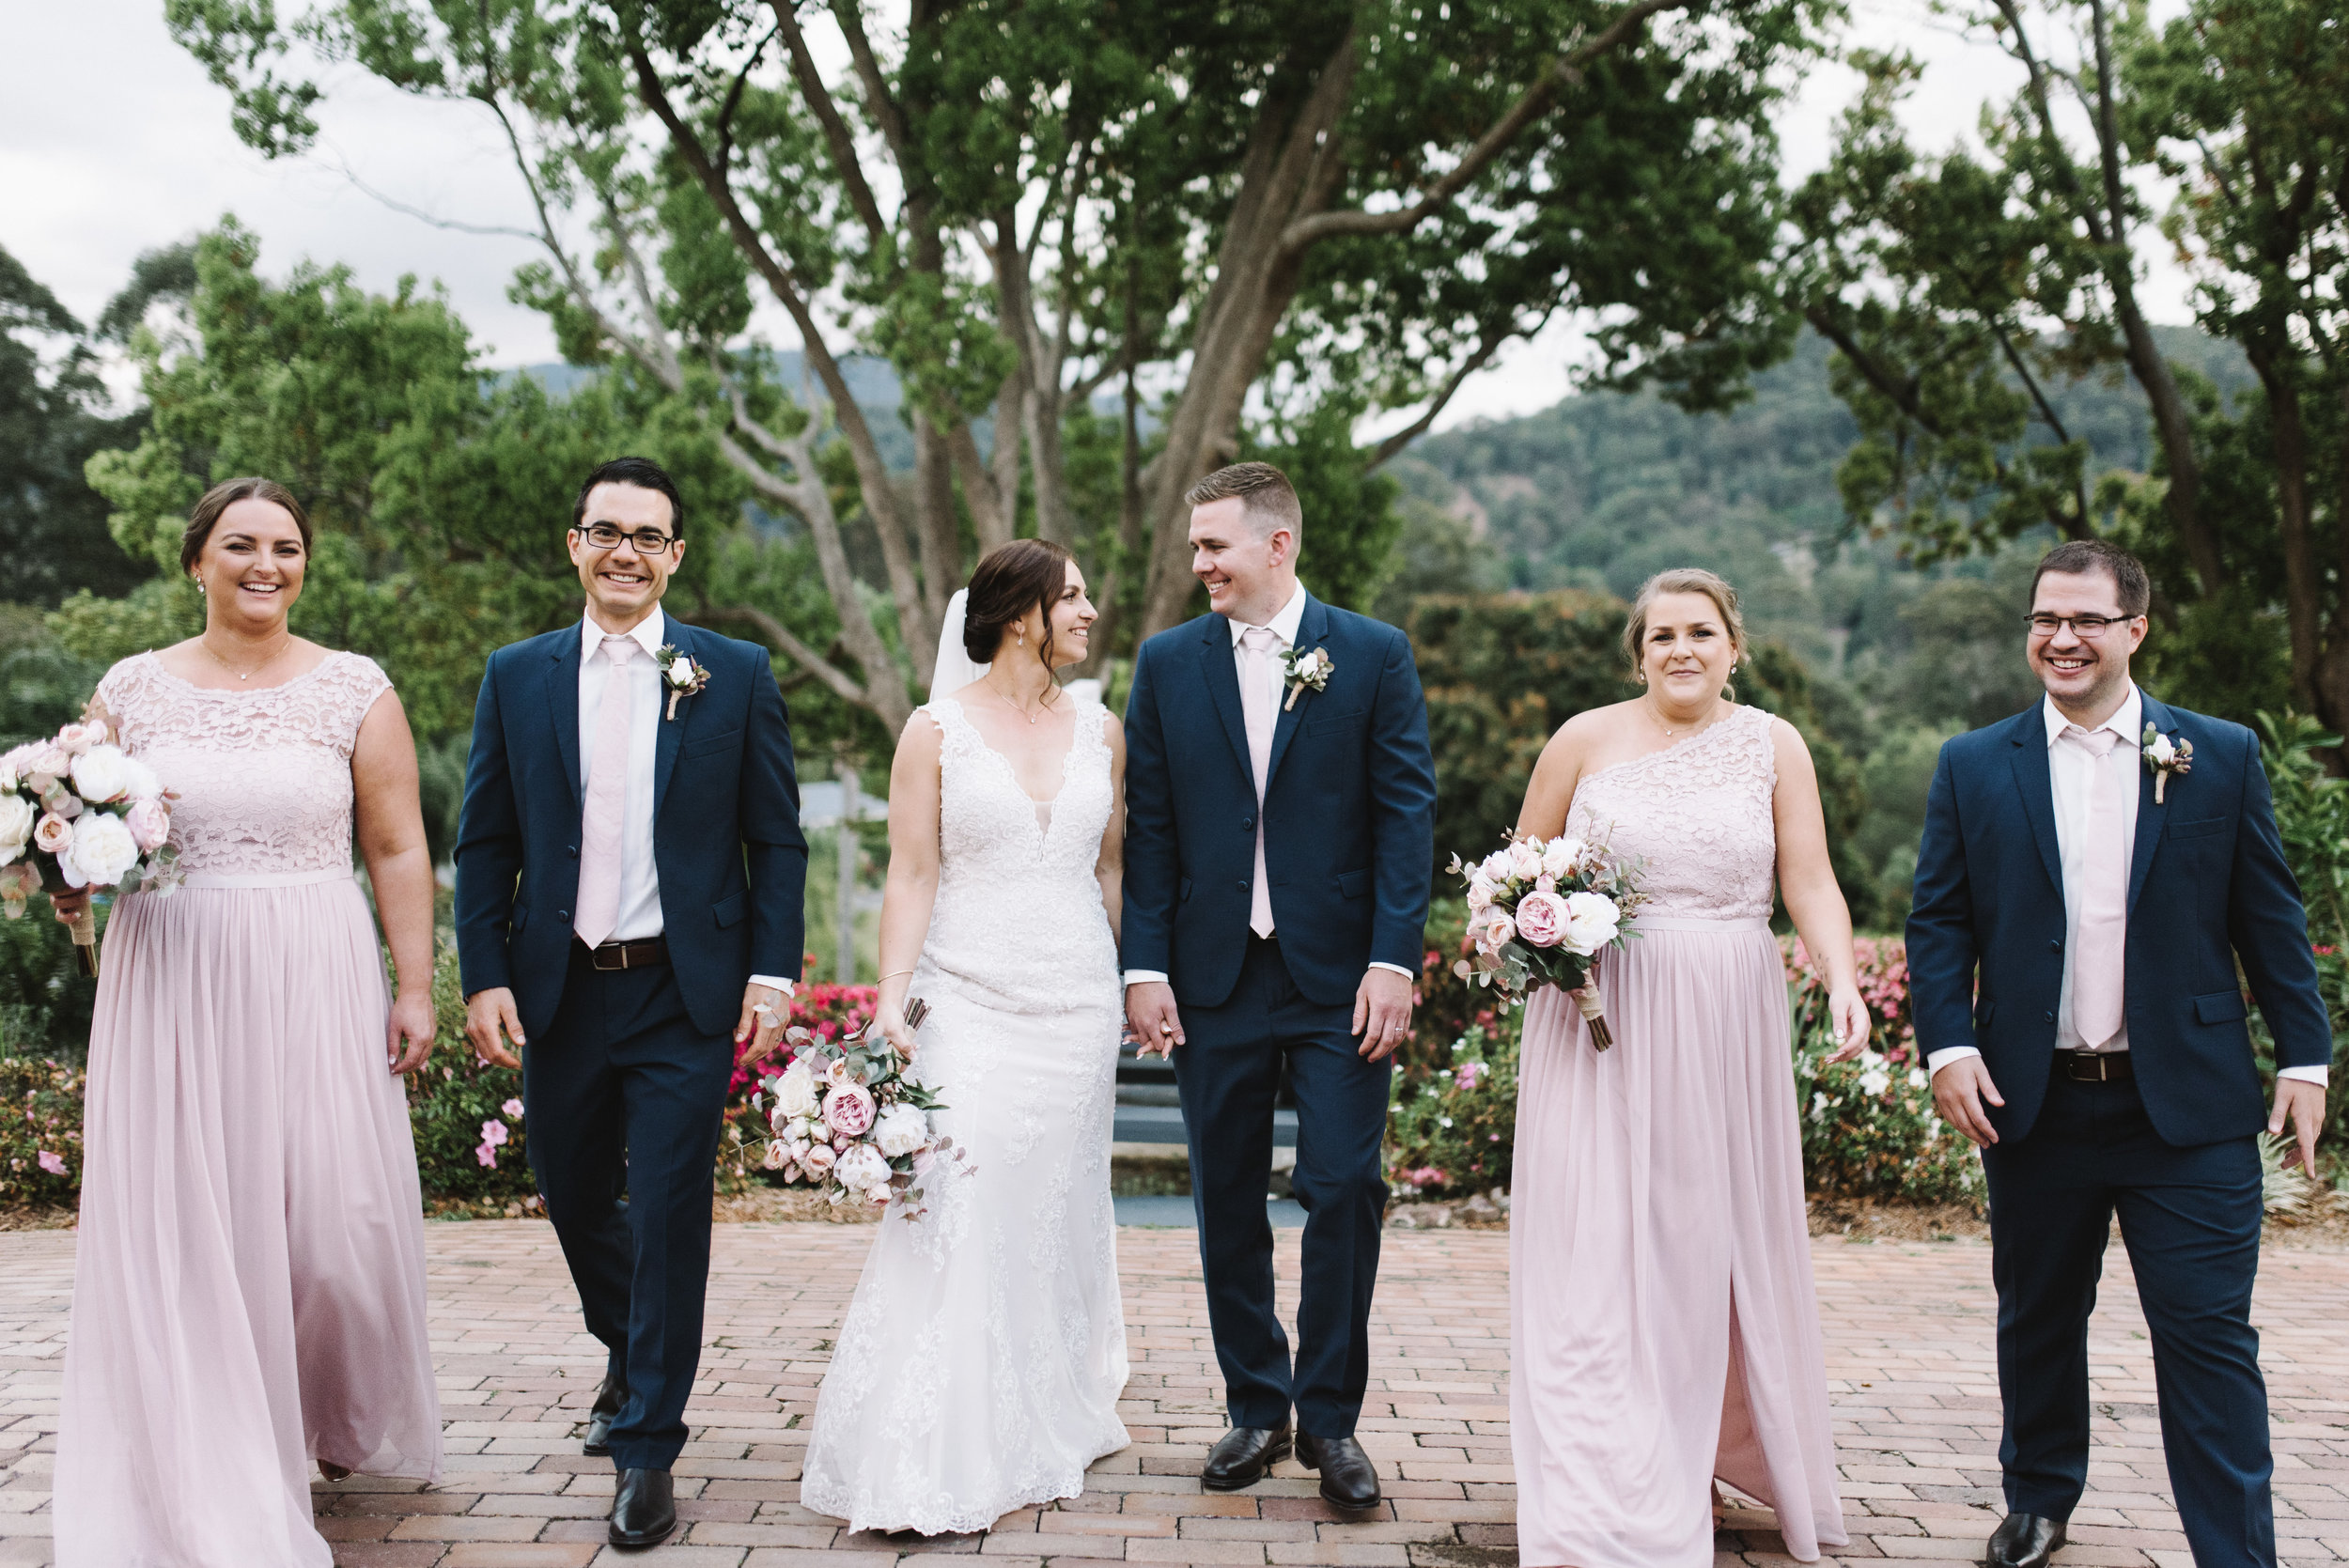 LAURENOLIVIA-austinvilla-estate-wedding-62.jpg